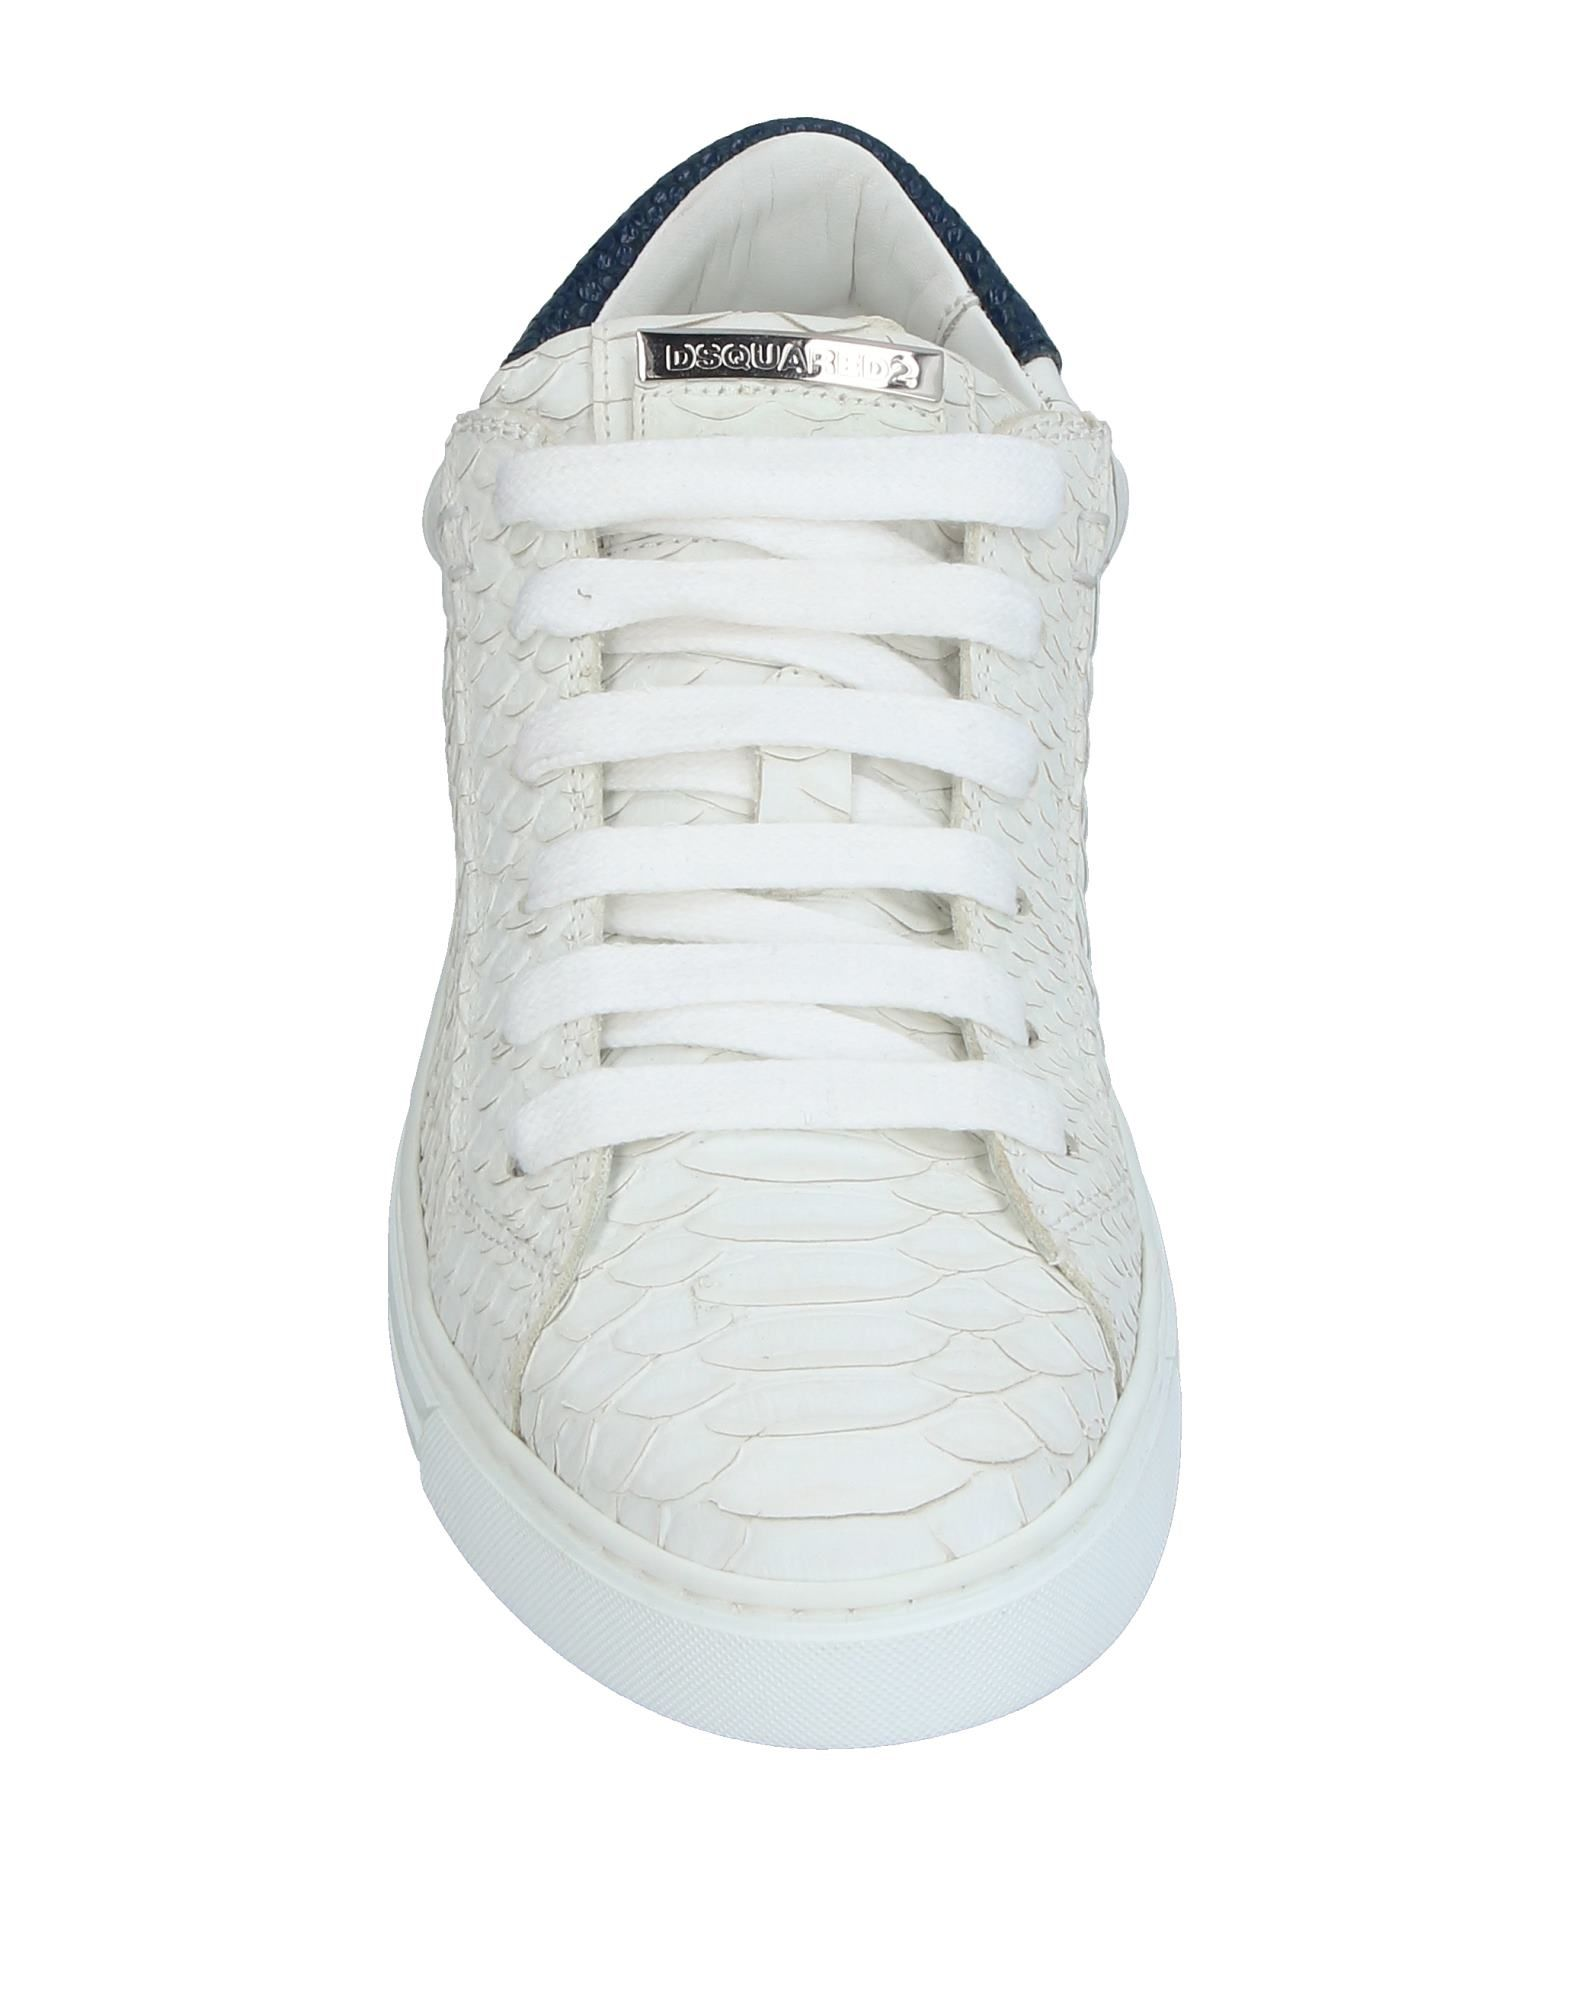 Rabatt  Schuhe Dsquared2 Sneakers Damen  Rabatt 11284218WW 30f57b